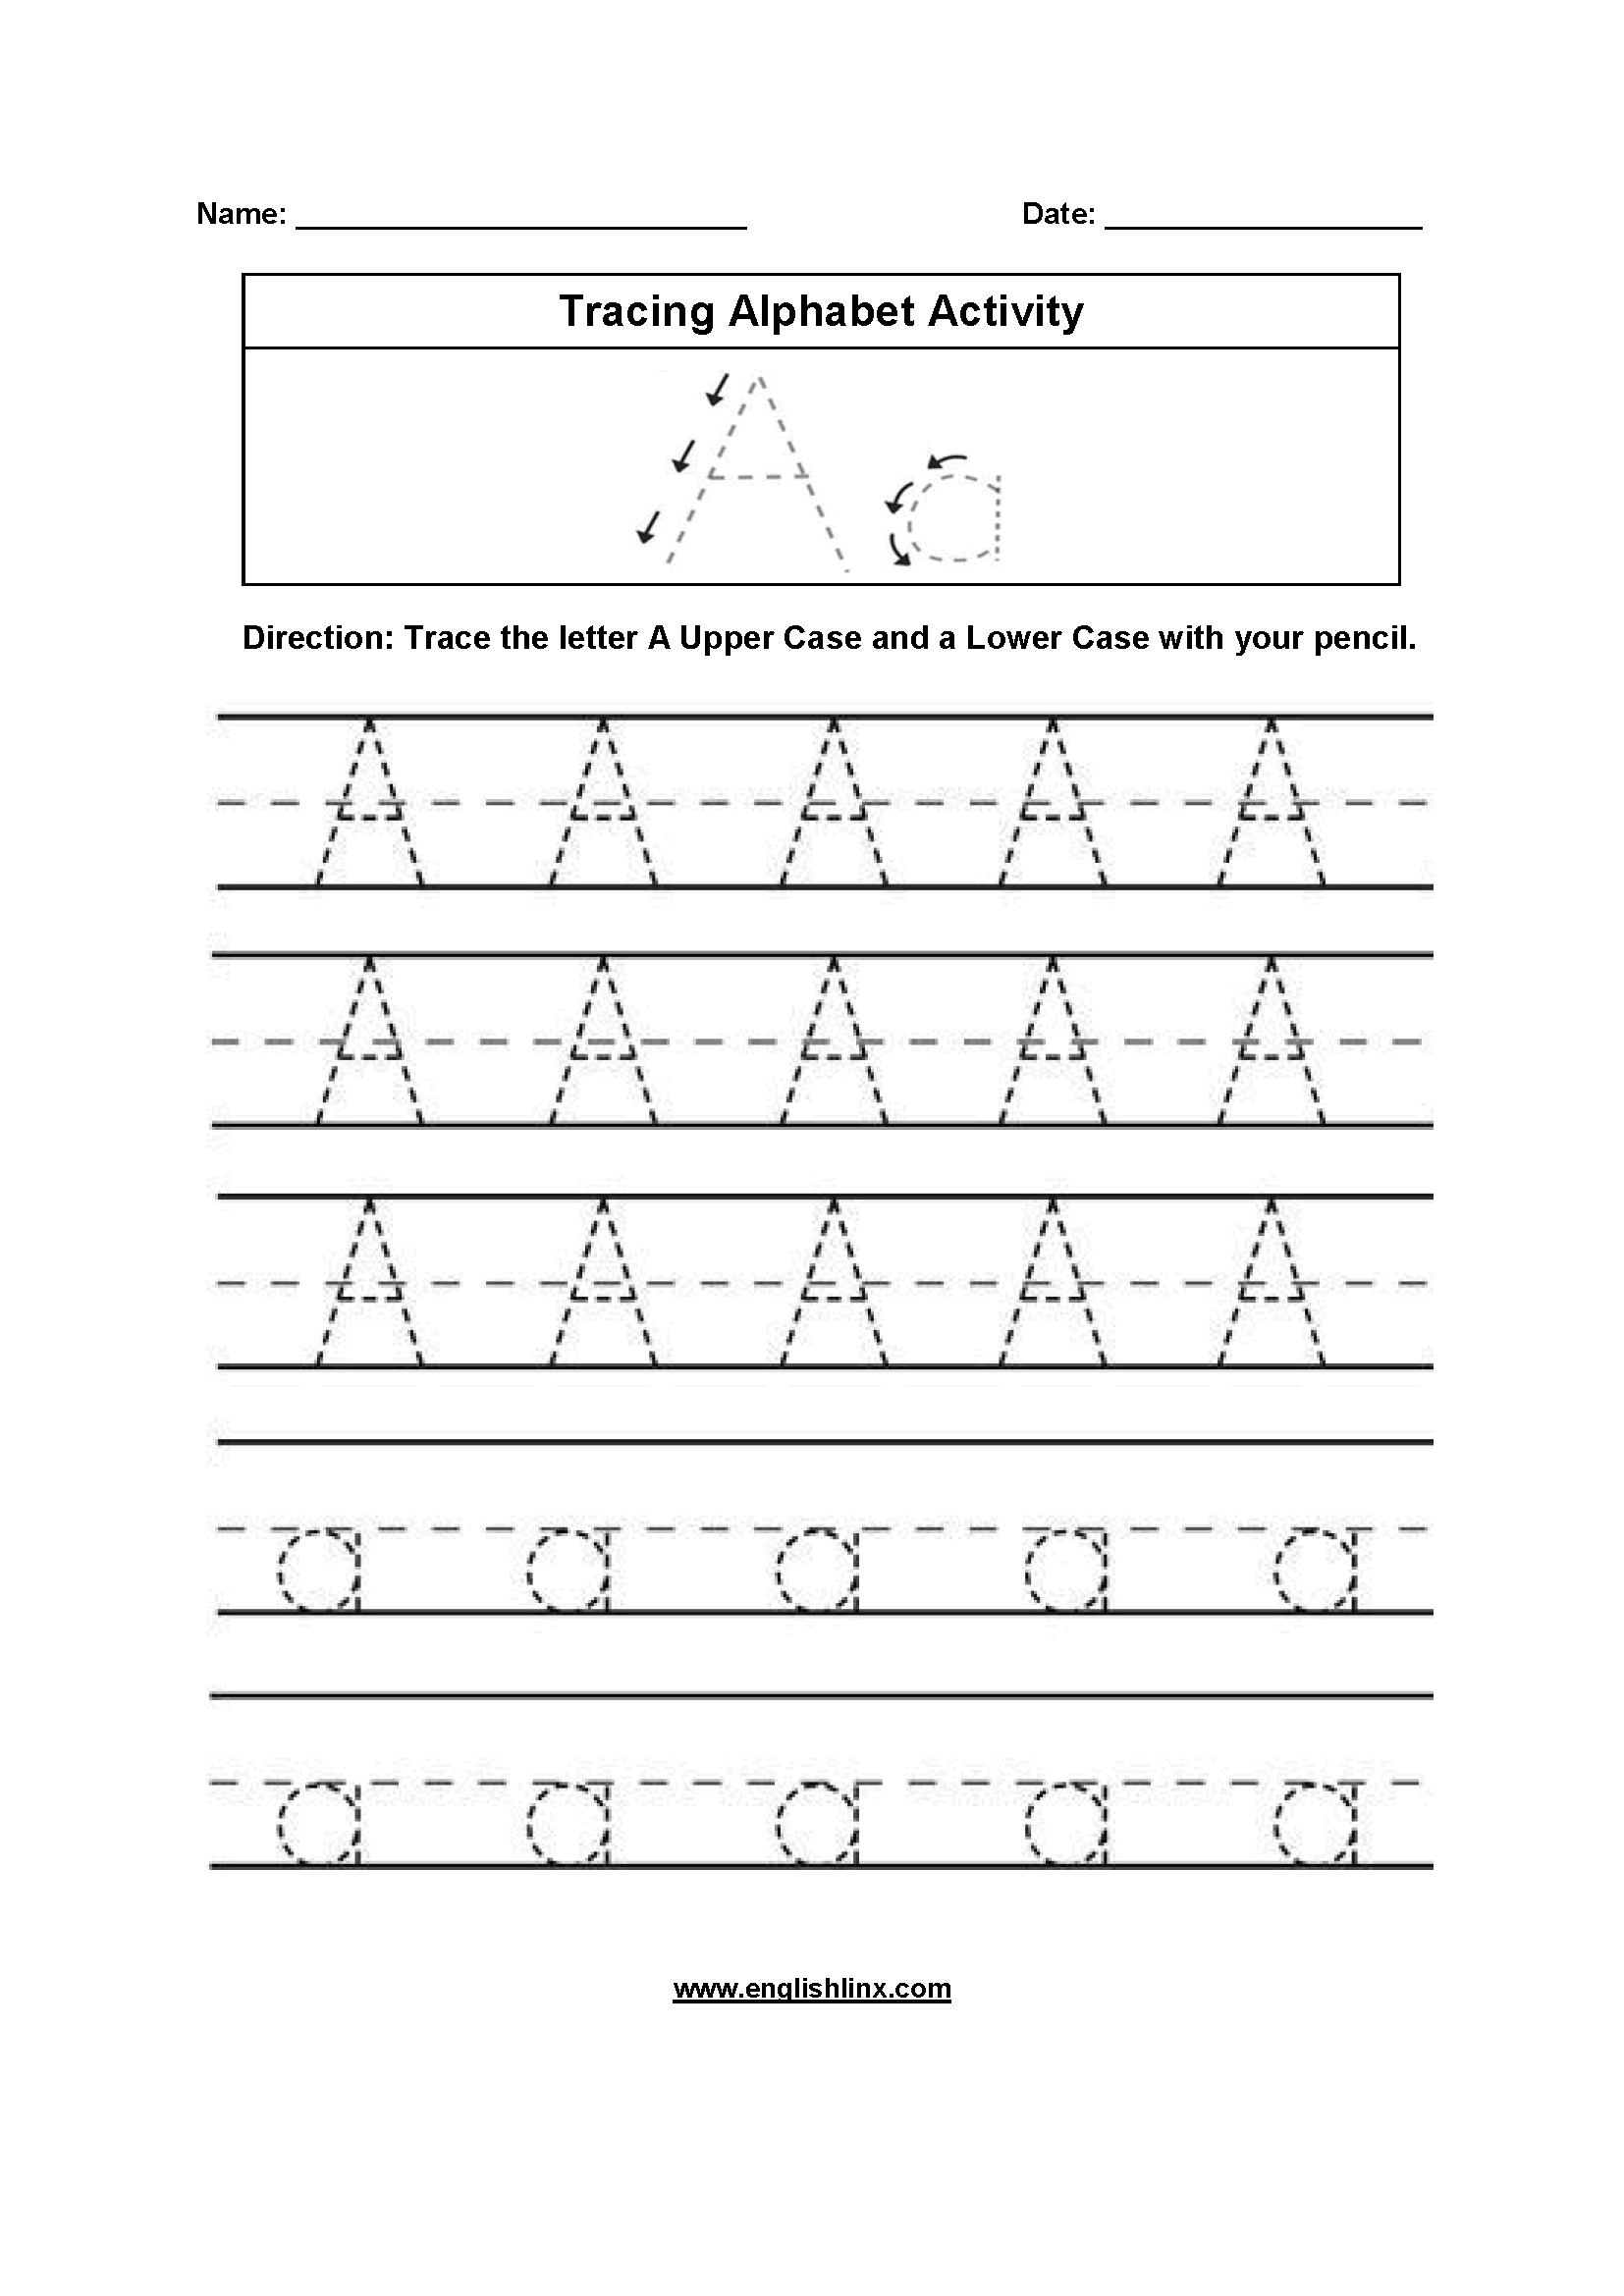 Alphabet Worksheets | Tracing Alphabet Worksheets intended for Alphabet Tracing A-Z Pdf